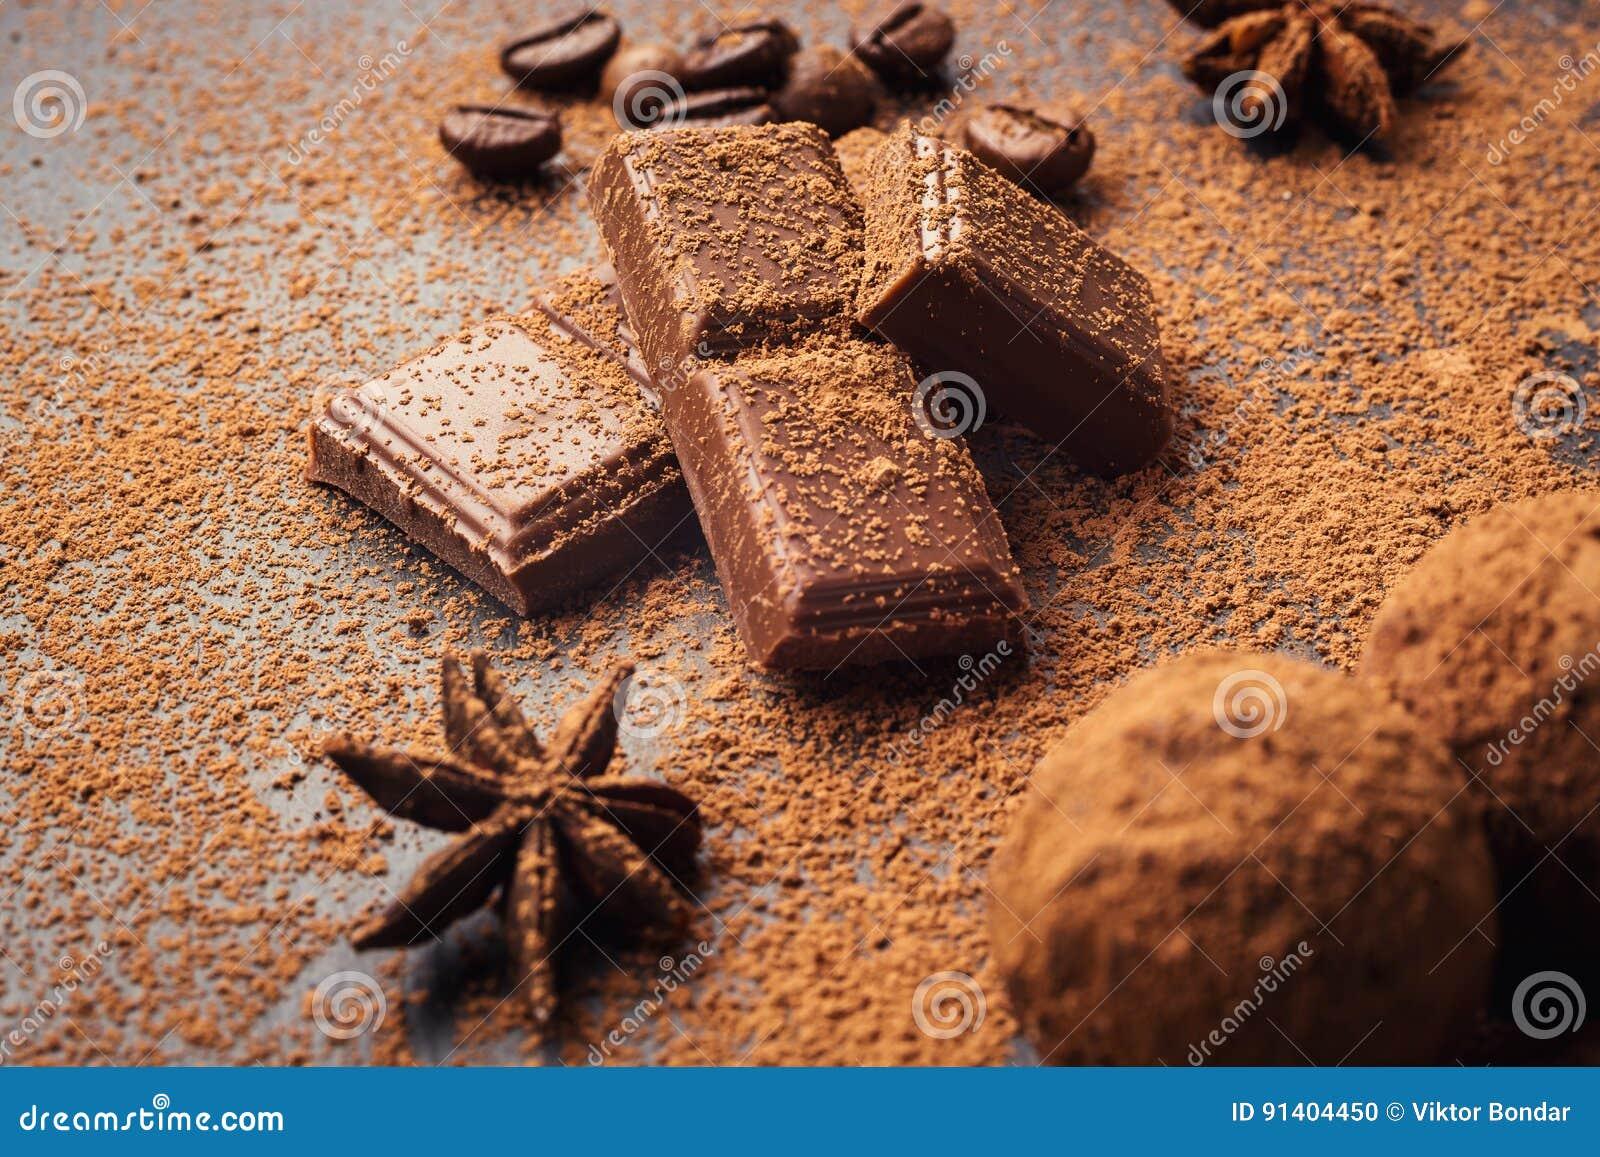 Chocolate truffle,Truffle chocolate candies with cocoa powder.Homemade fresh energy balls with chocolate.Gourmet assorted truffle